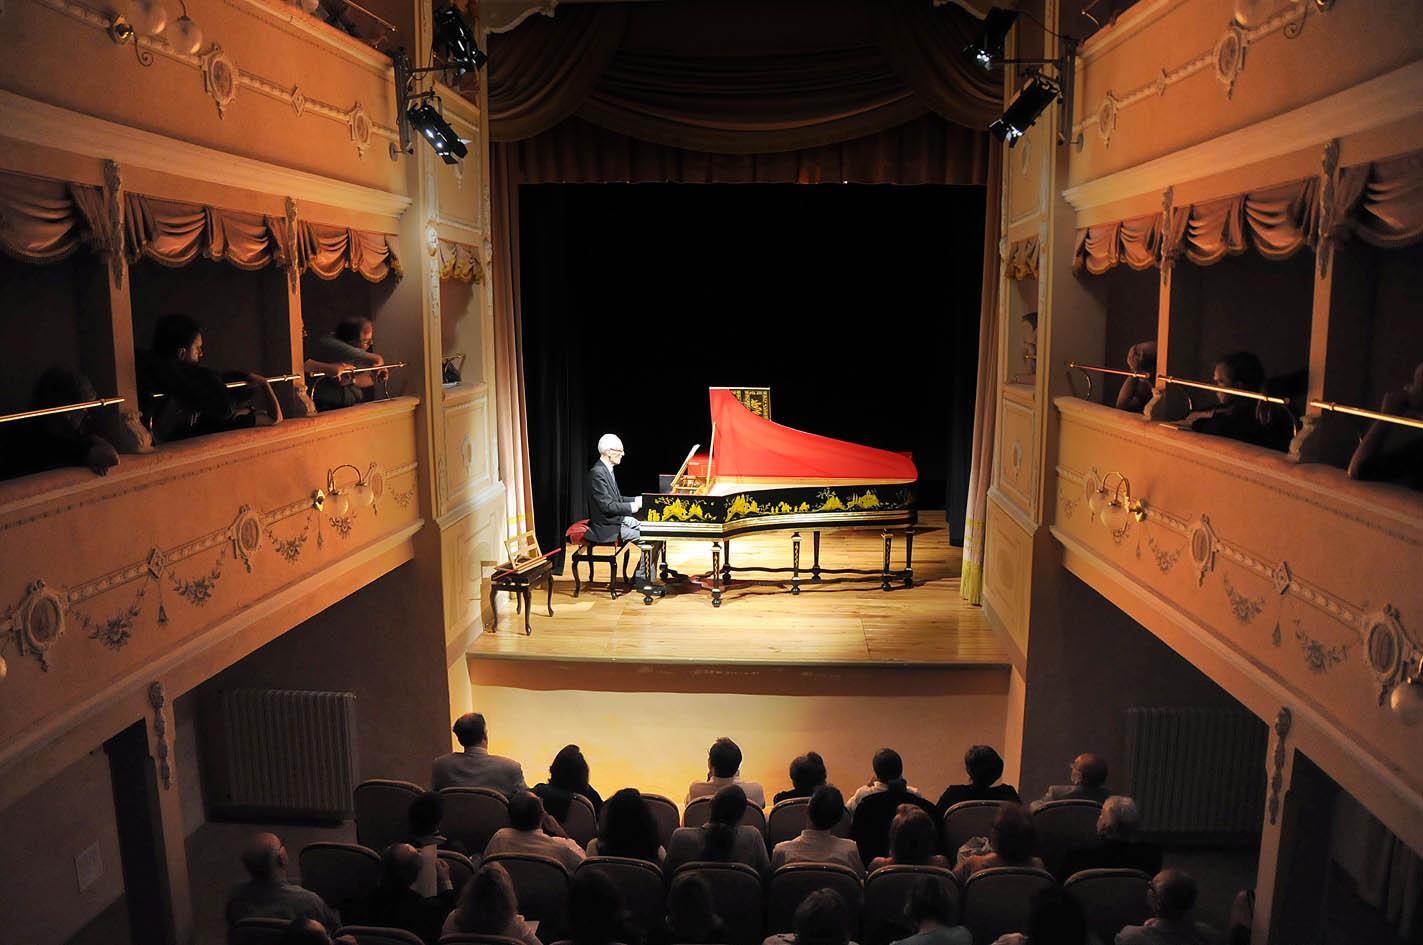 Gustav Leonhardt al clavicembalo